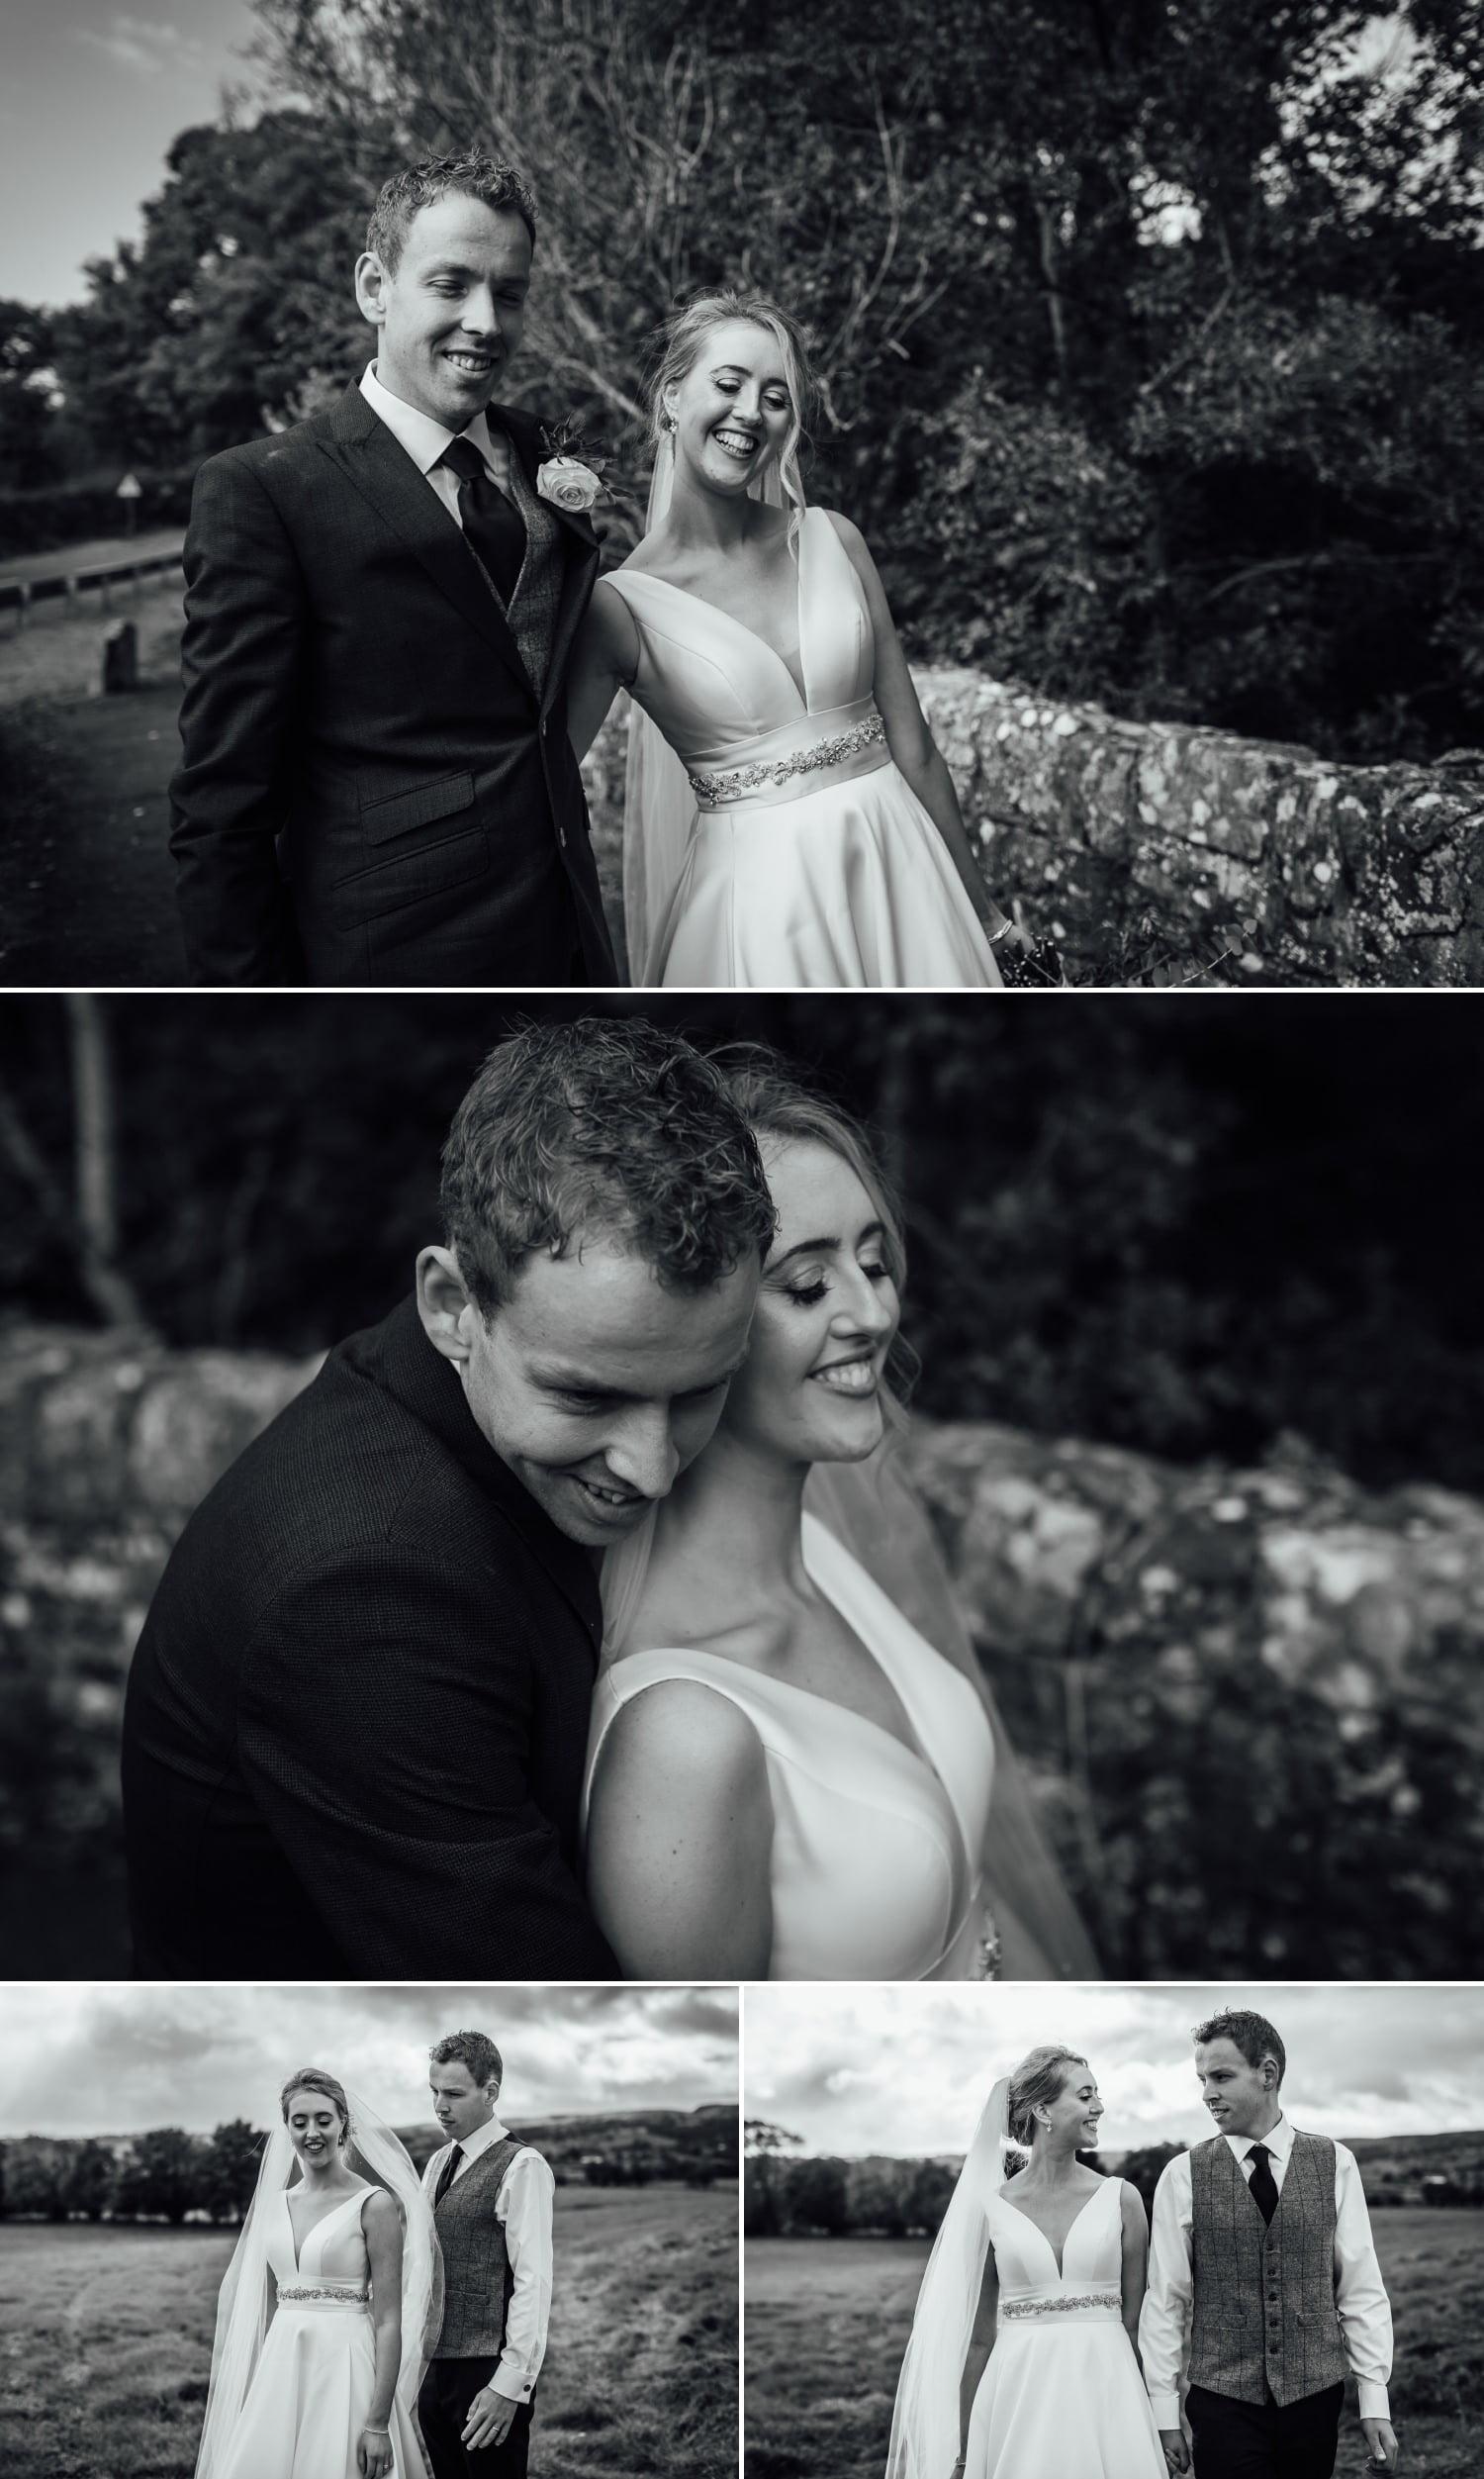 Black and white portraits of wedding couple